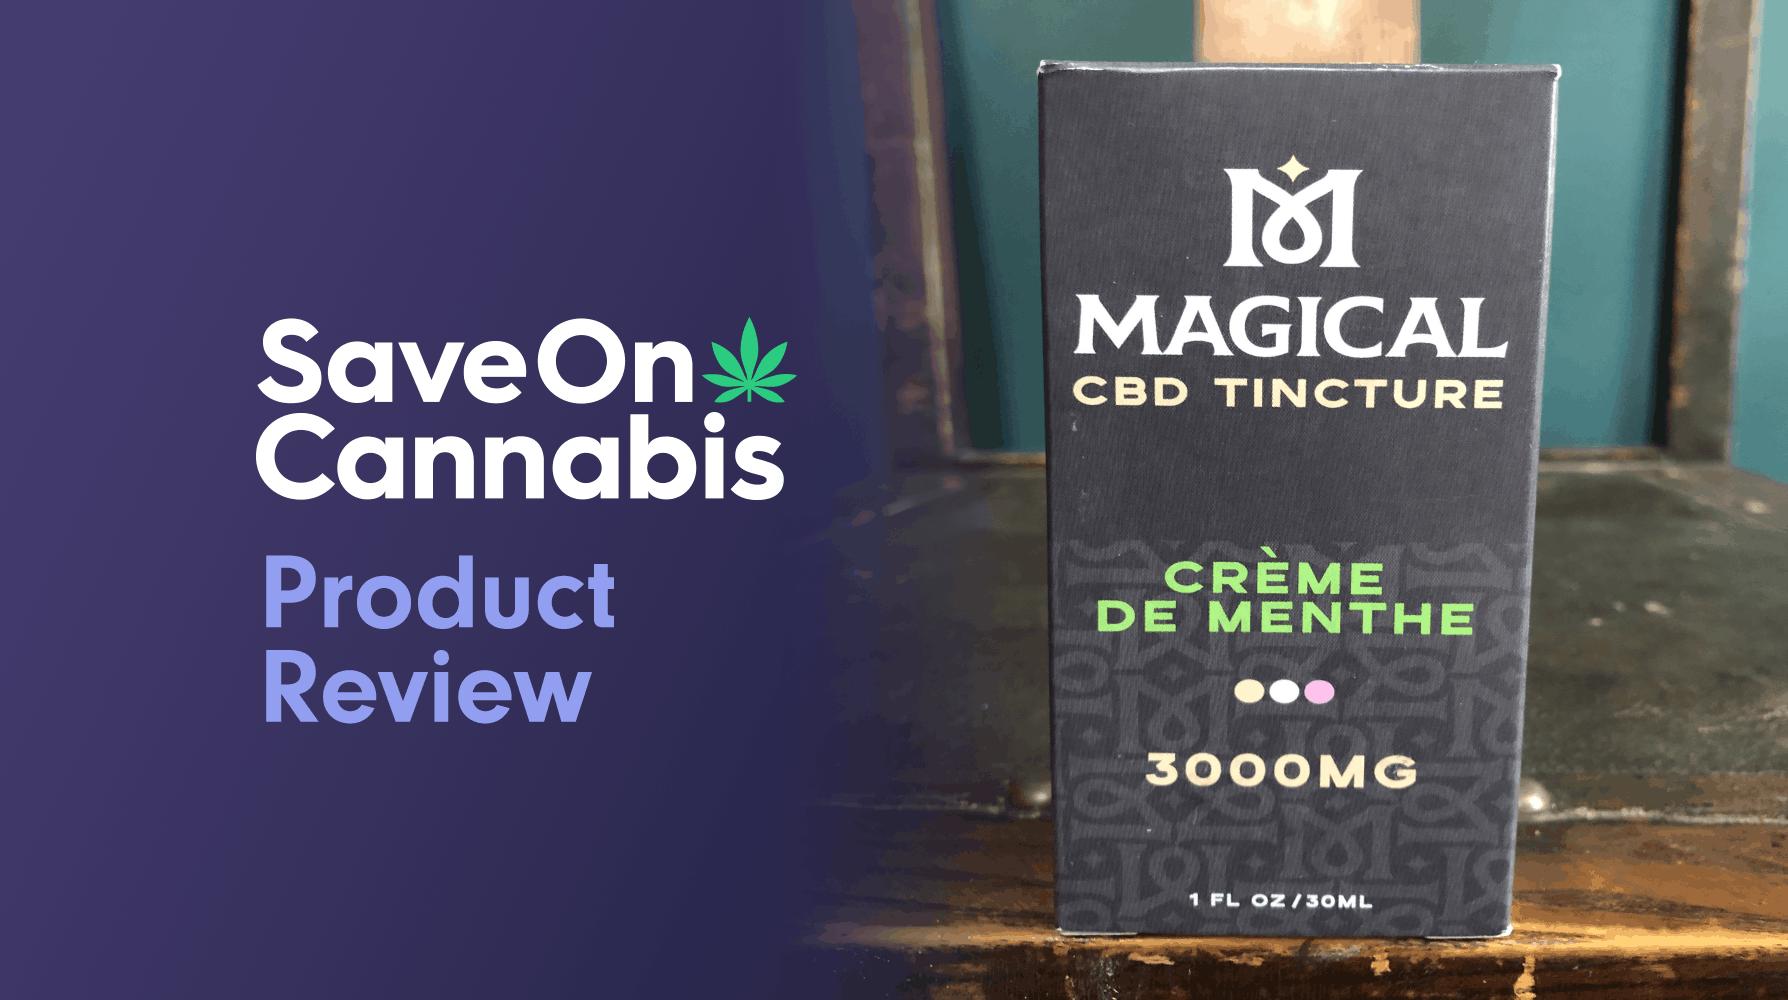 Magical CBD Tincture Creme De Menthe 3000 Mg Review Save On Cannabis Website